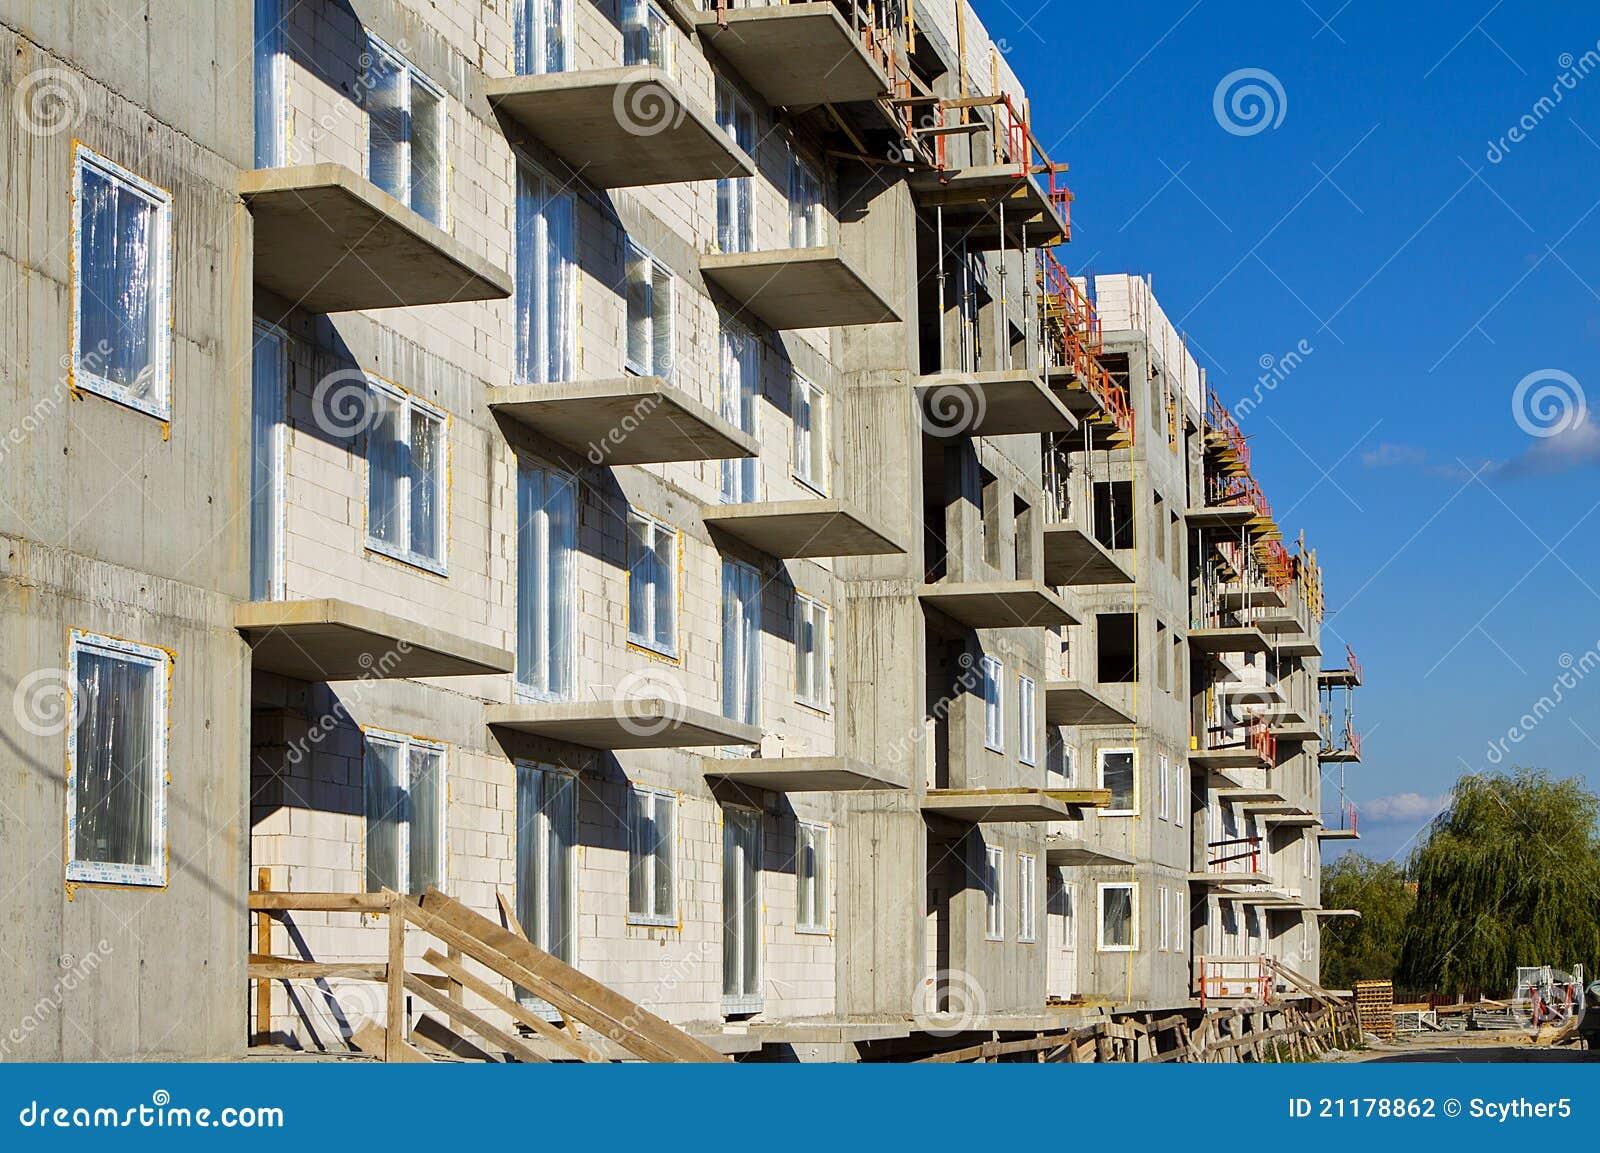 Construction in progress. Concrete raw apartment.